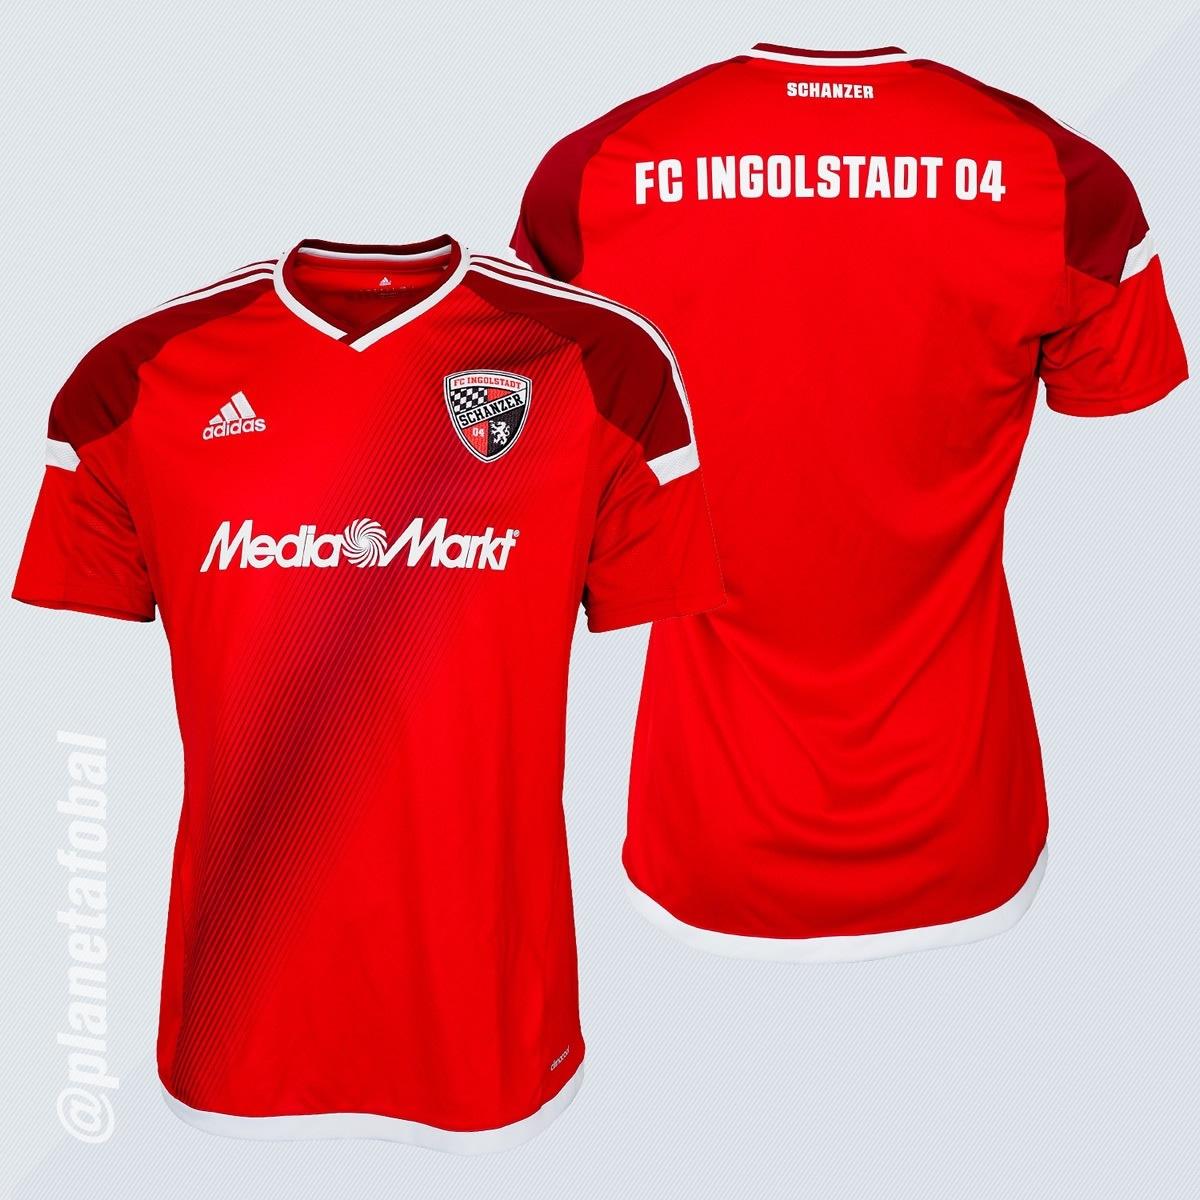 Casaca titular del FC Ingolstadt 04 | Imágenes Web Oficial